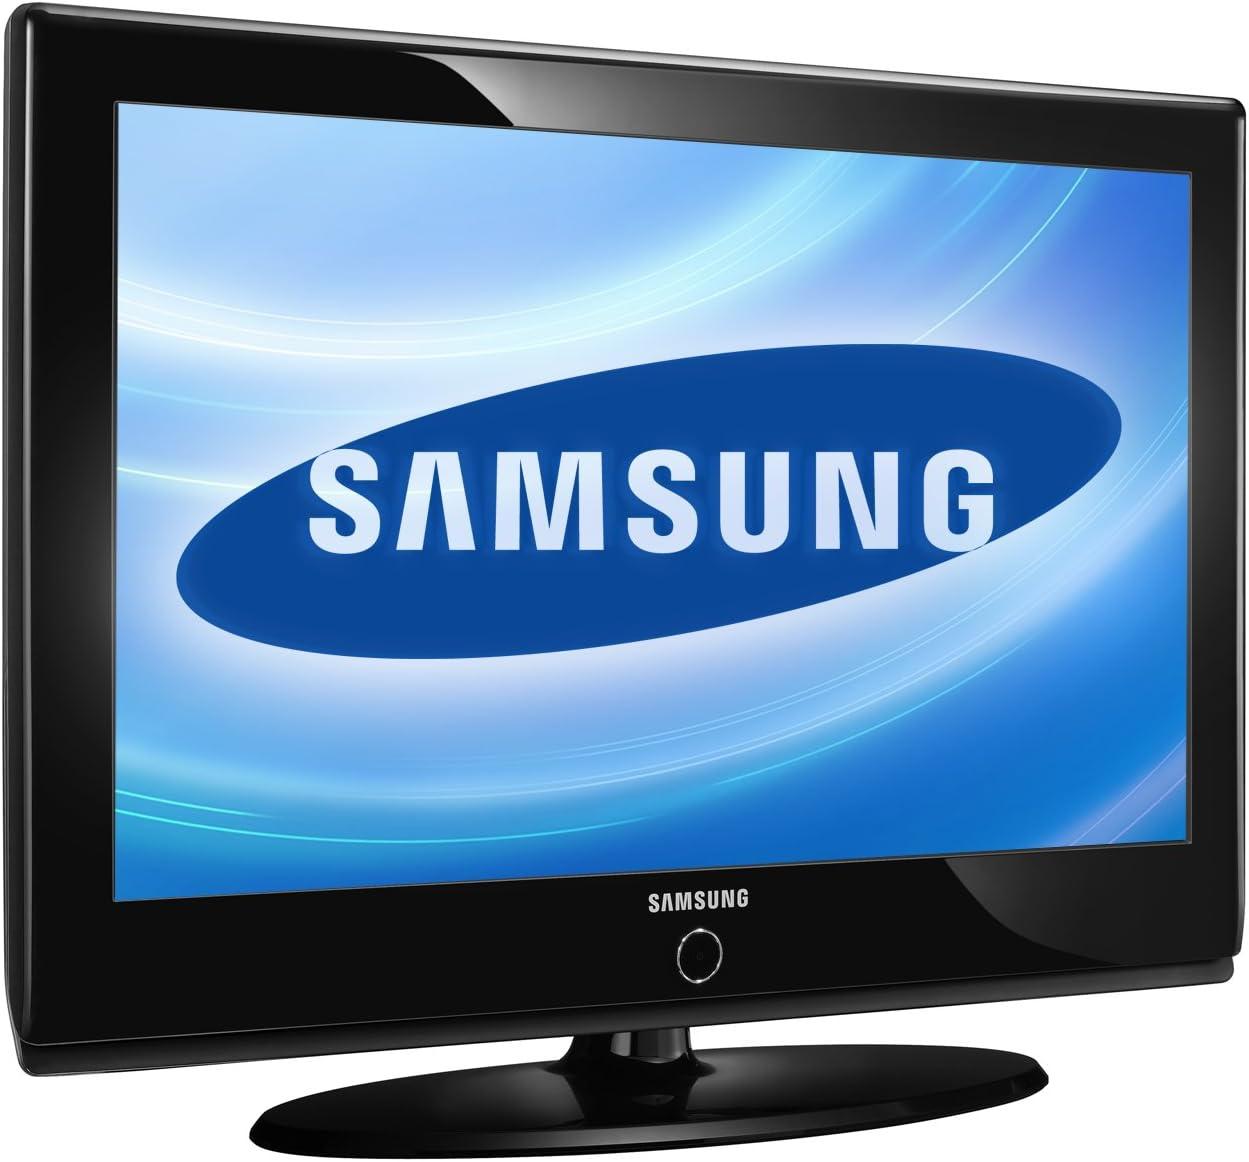 Samsung LE 32 A 436 - Televisión HD, Pantalla LCD 32 pulgadas ...